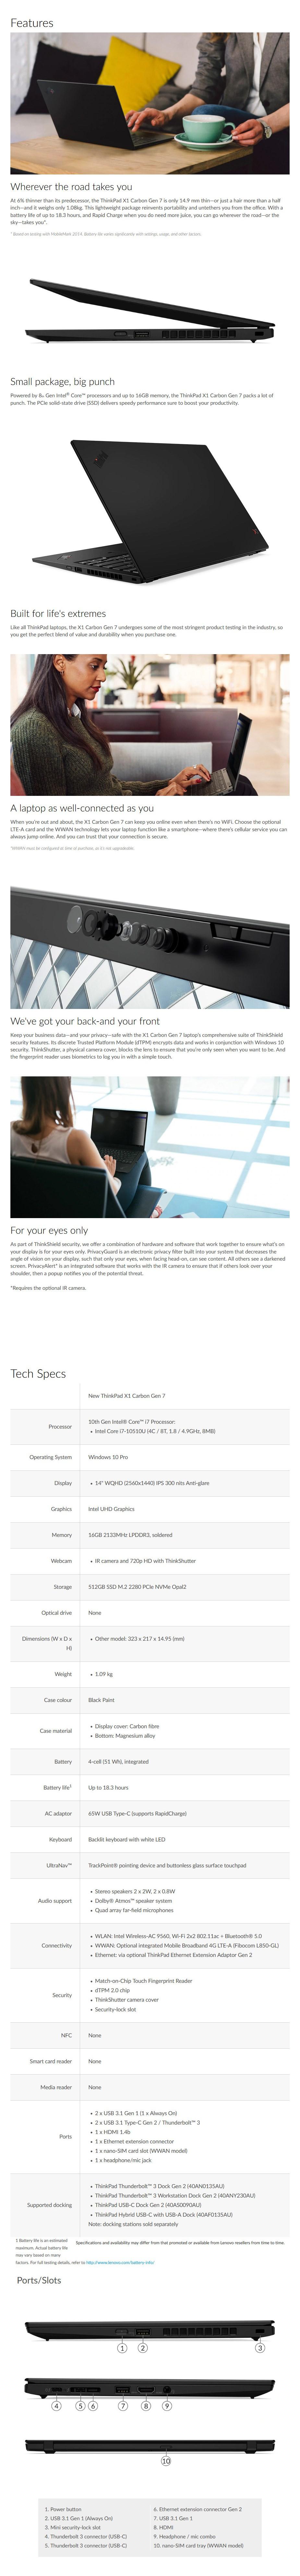 "Lenovo X1 Carbon 7th Gen 14"" Laptop i7-10510U 16GB 512GB W10P - Overview 1"